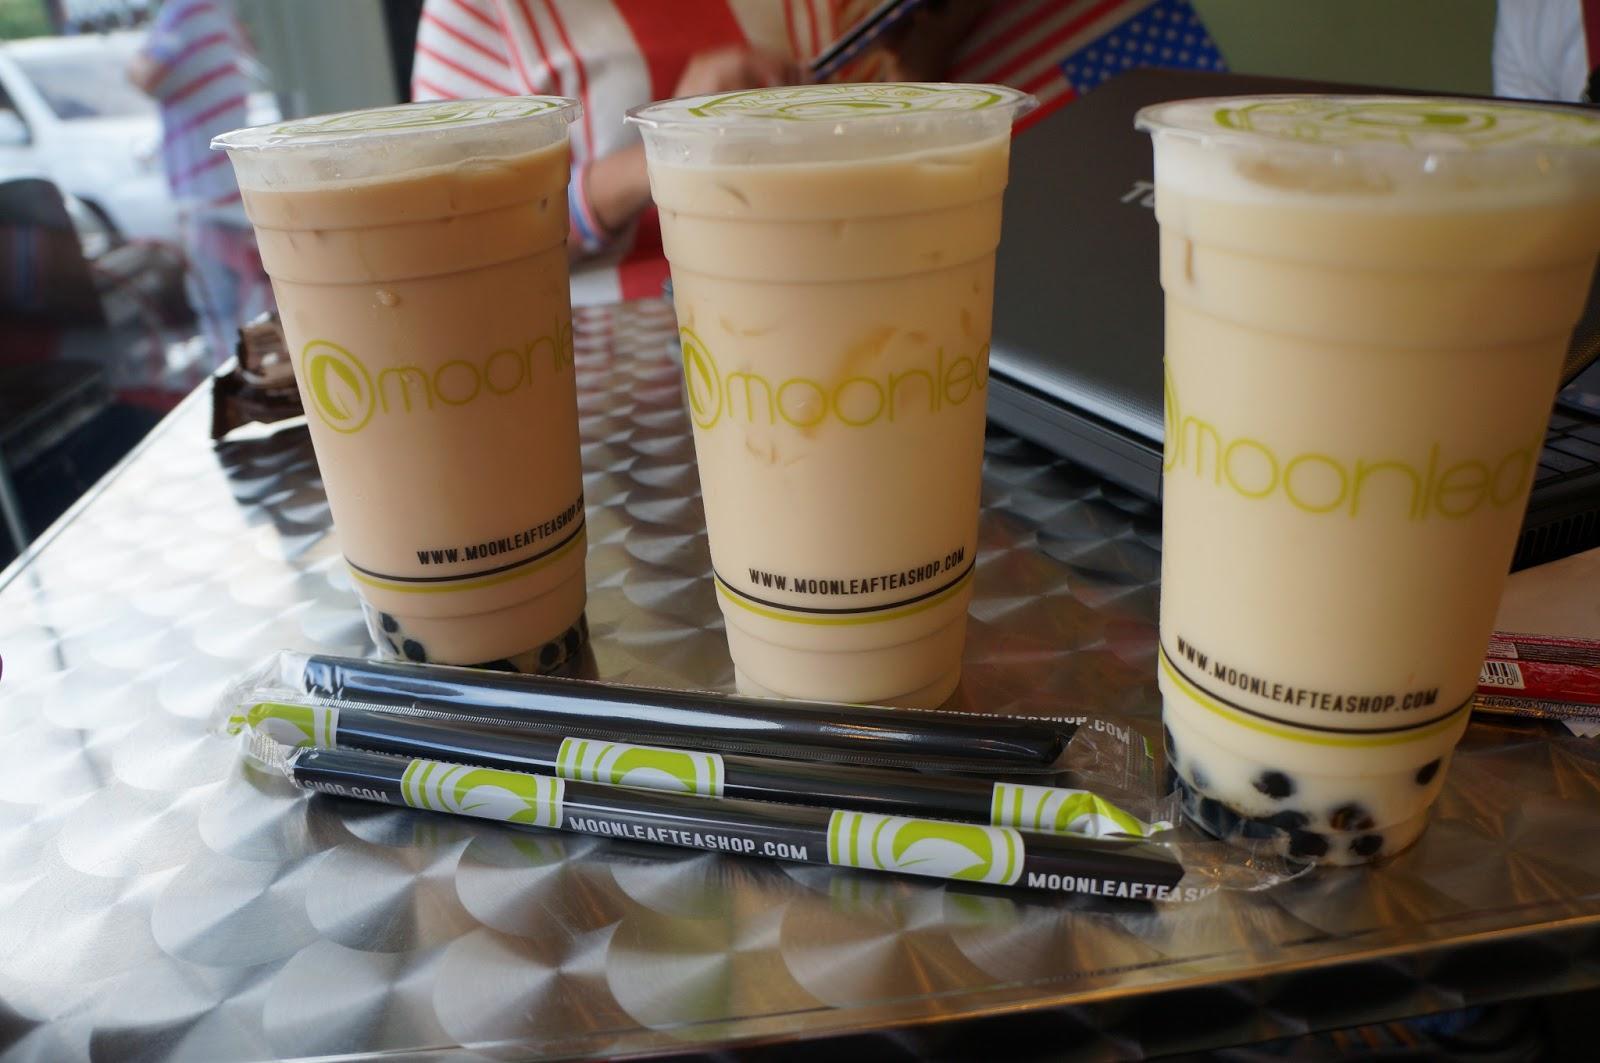 moonleaf tea shop philippines Moonleaf tea shop maginhawa - 103 maginhawa st, up teacher's village, diliman, quezon city, metro manila, philippines.